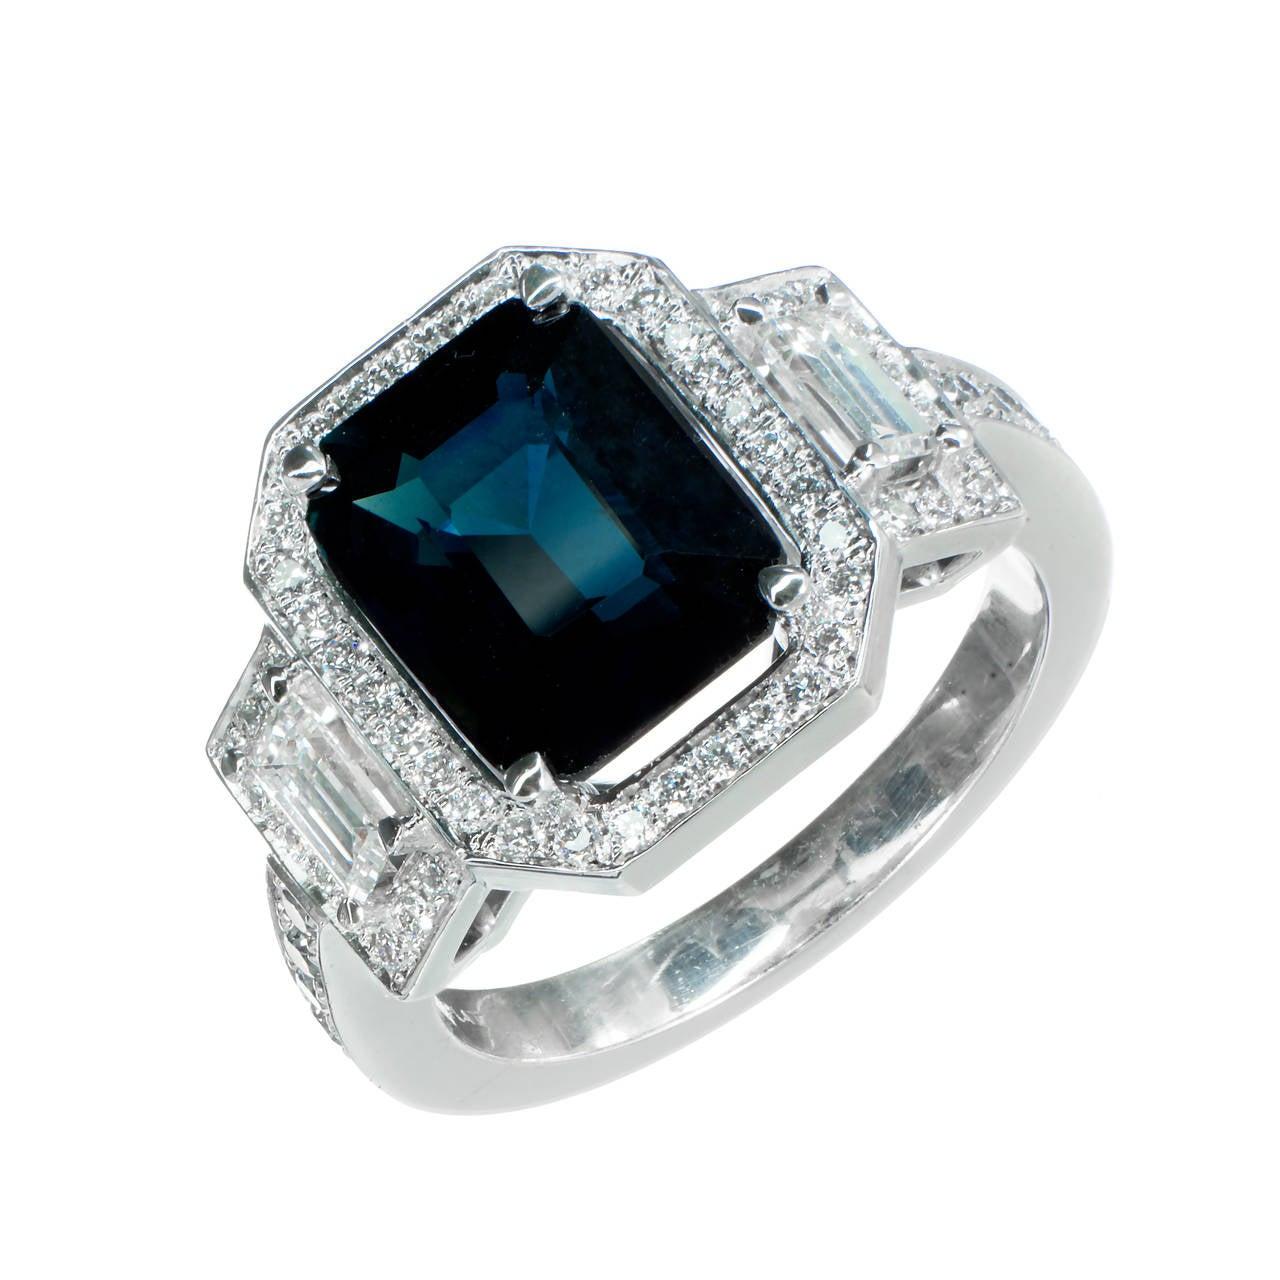 Peter Suchy 4.12 Carat Sapphire Diamond Platinum Triple Halo Engagement Ring 1